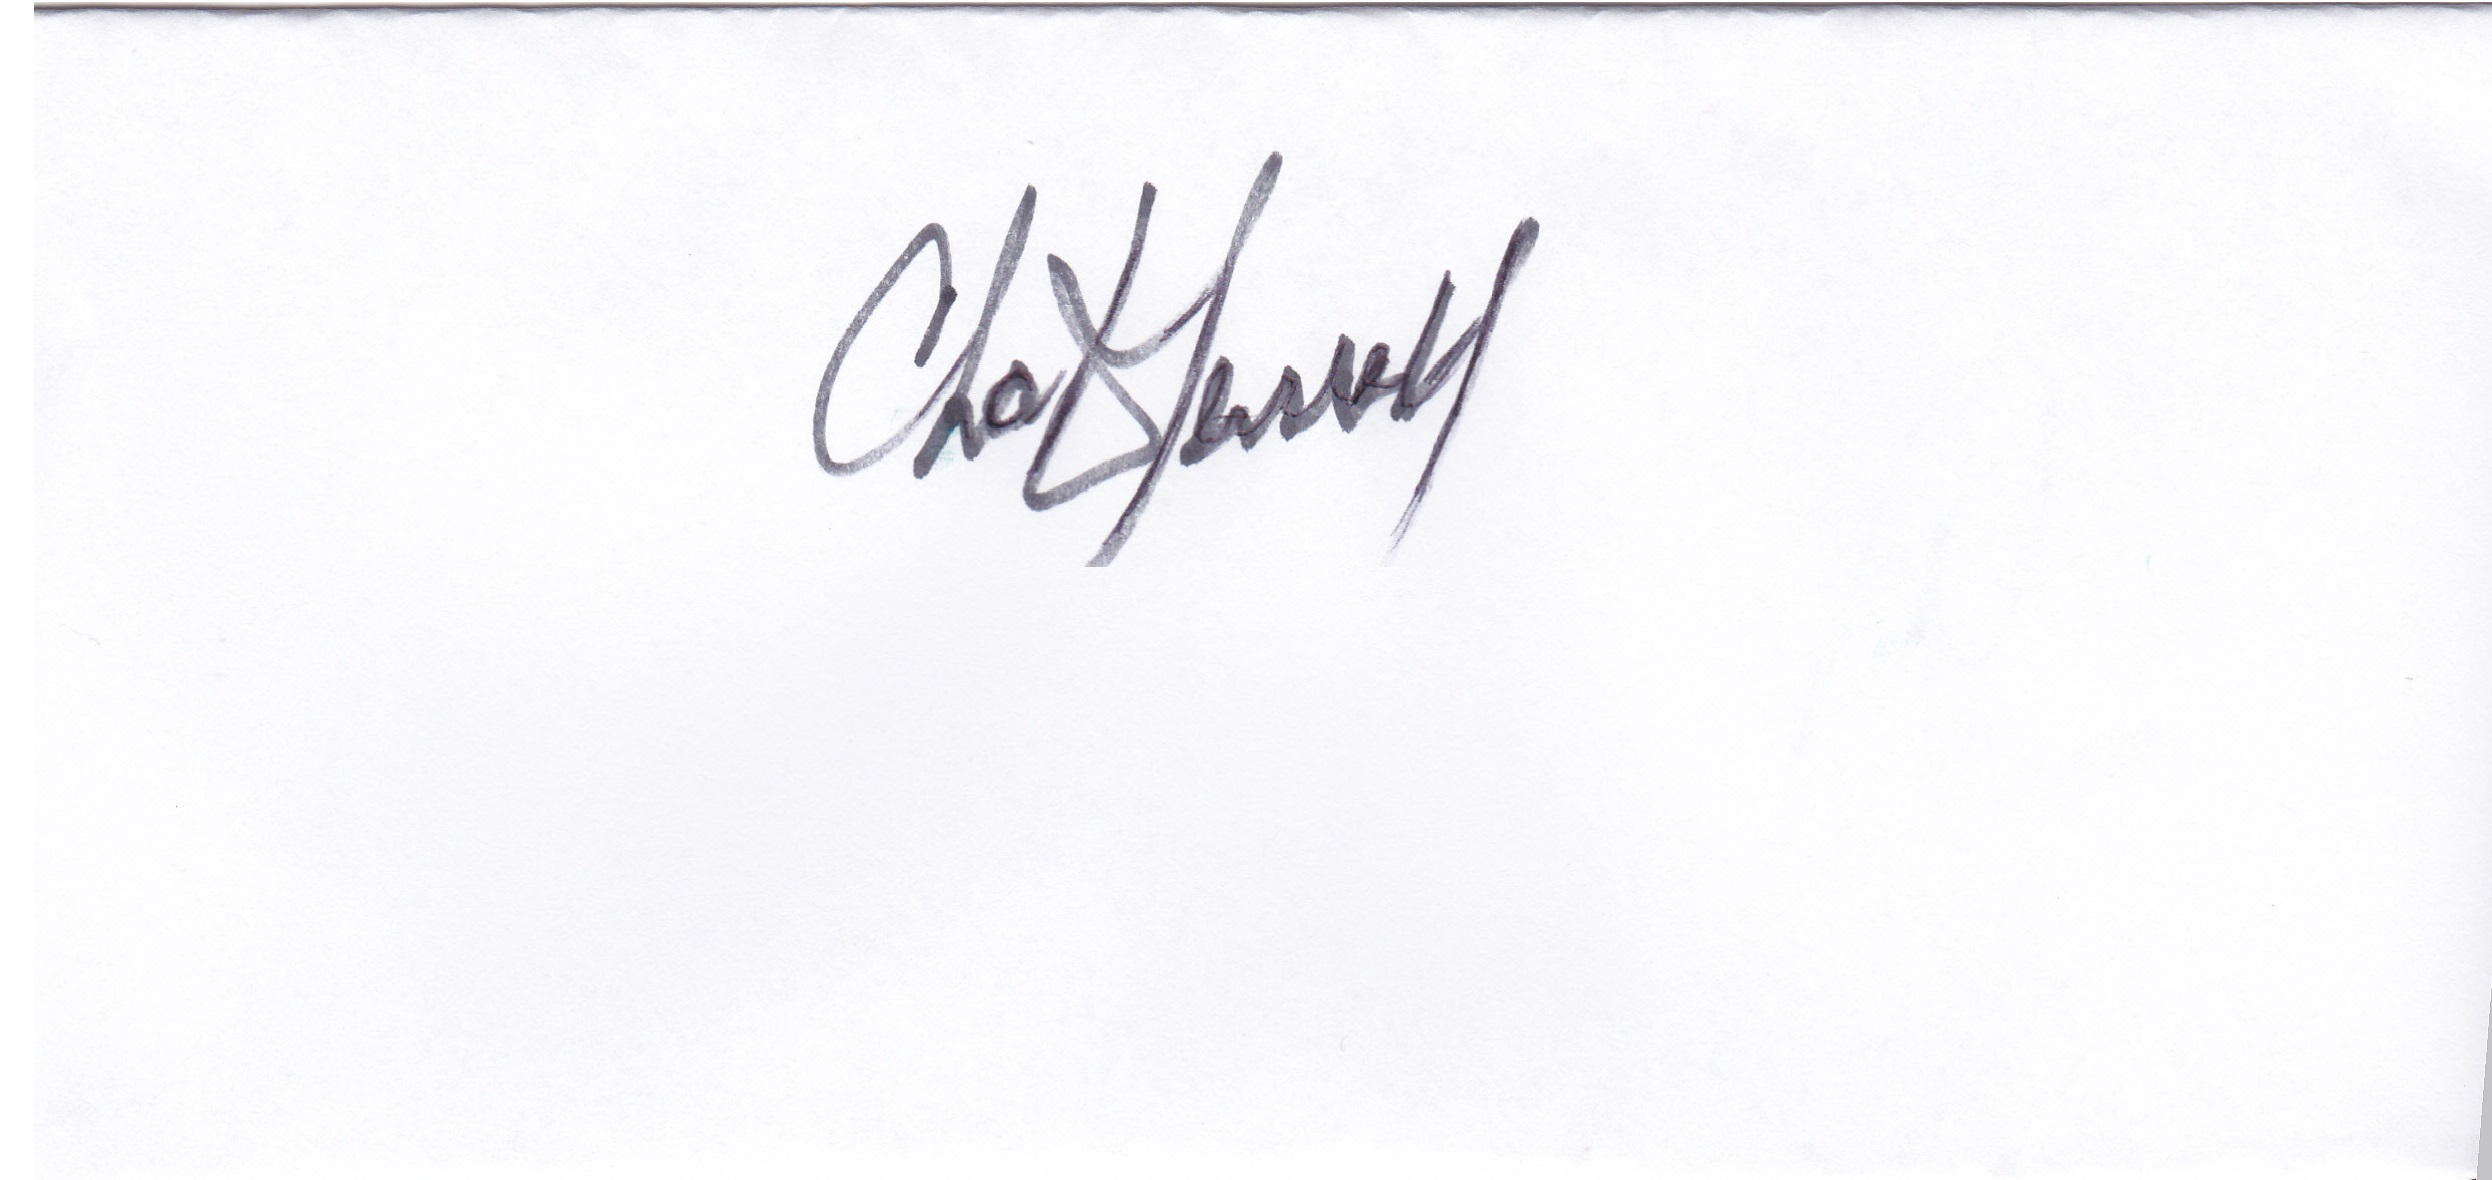 Chuck Terrell's Signature